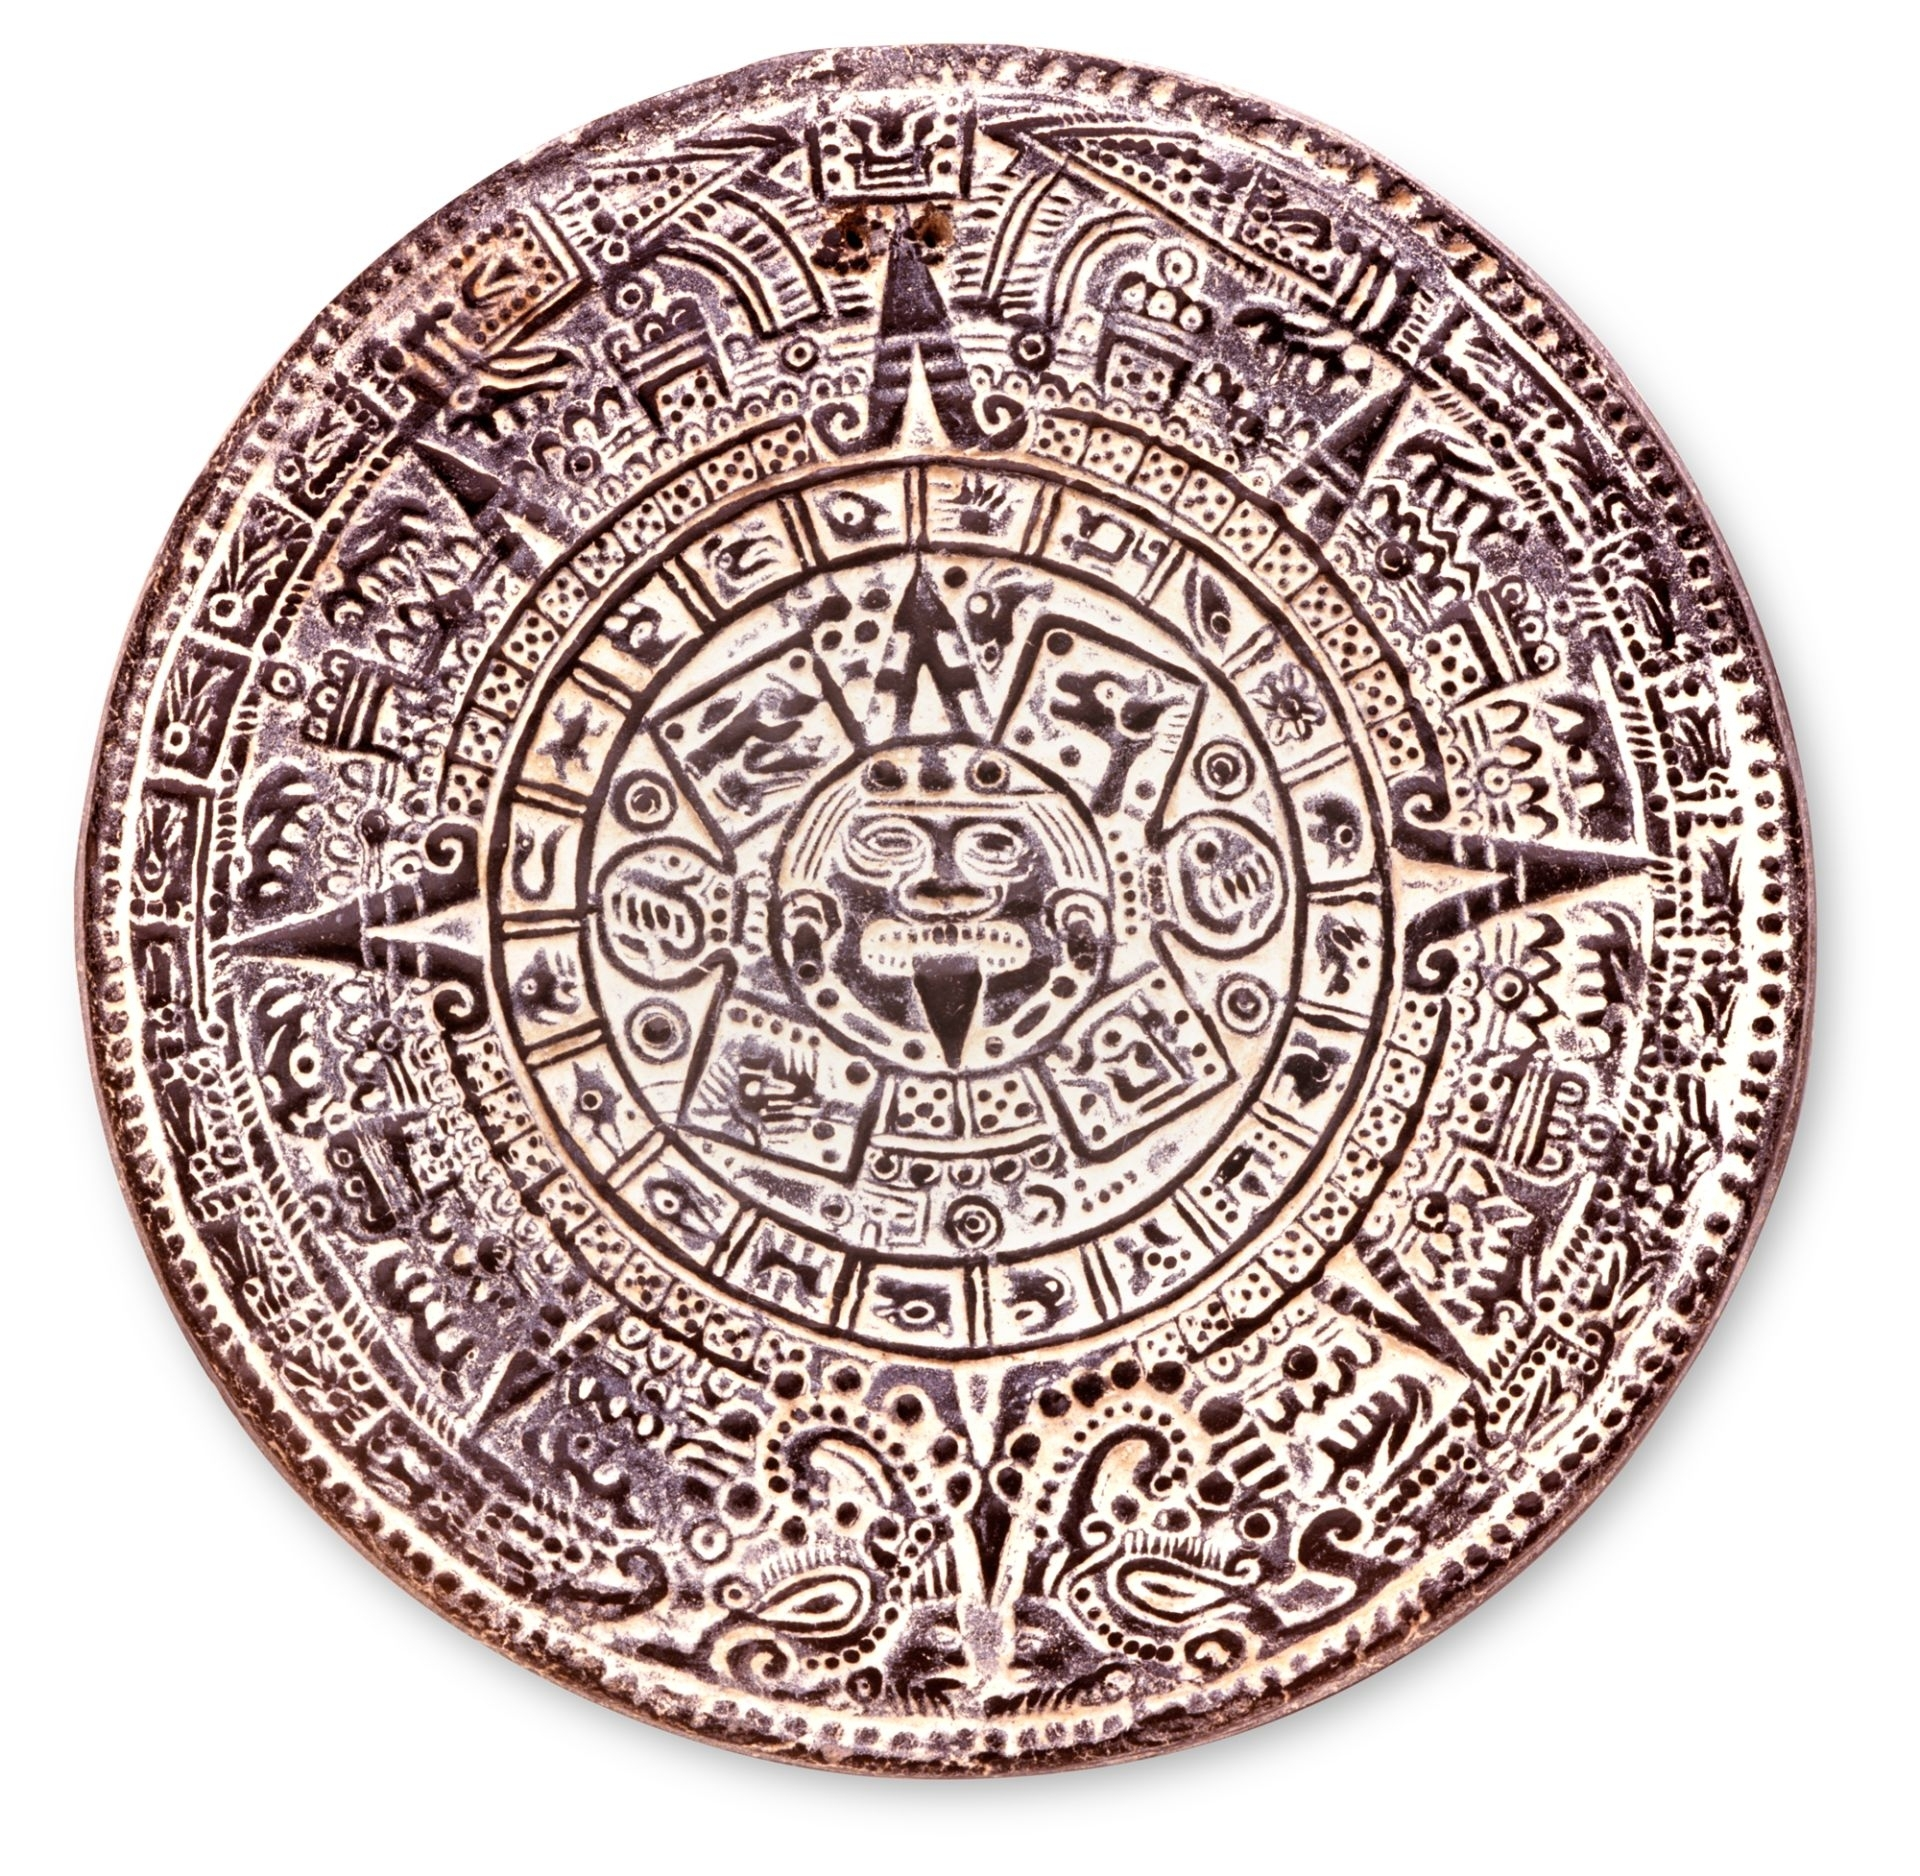 Aztec Calendar Stone | Aztec Calendar Facts | Dk Find Out regarding Aztec Calendar Symbols And Meanings